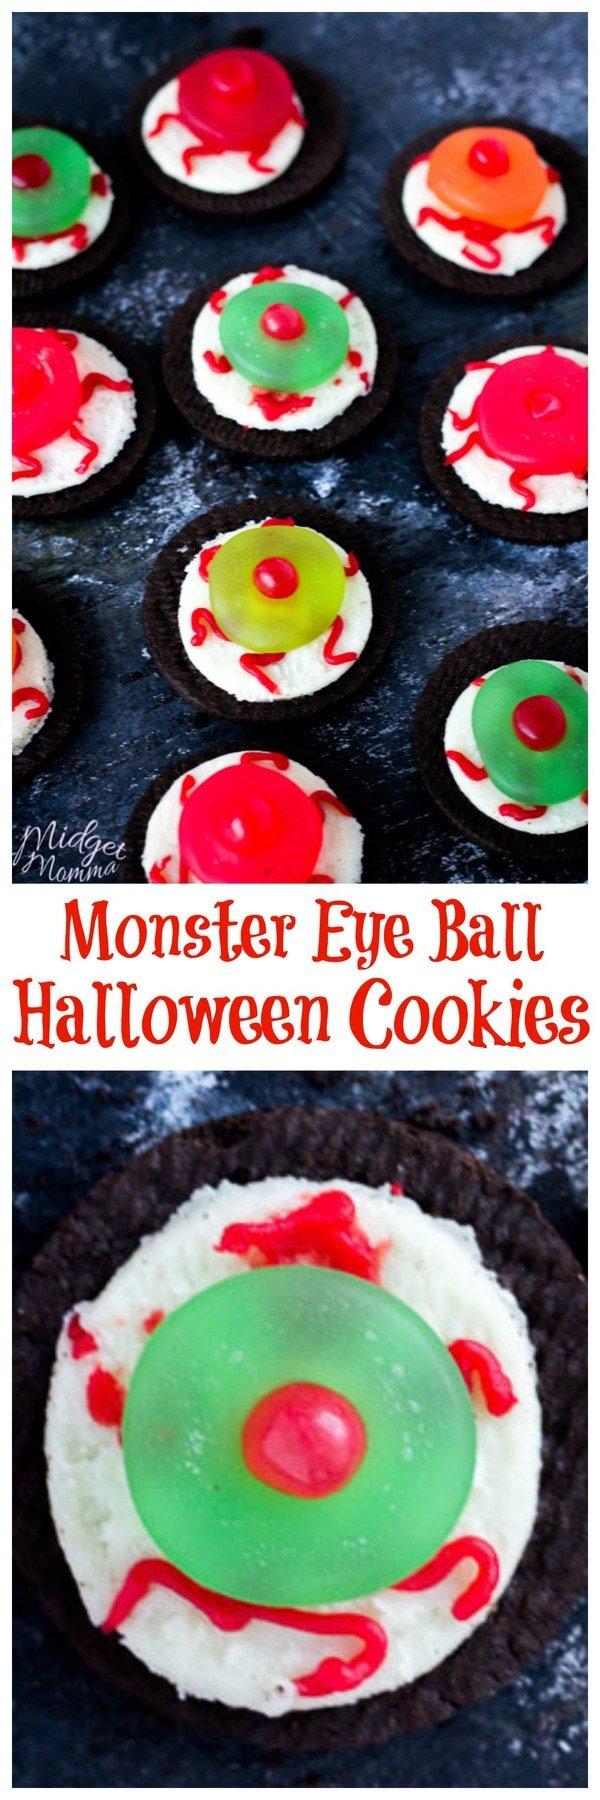 Monster Eye Ball Halloween Cookies